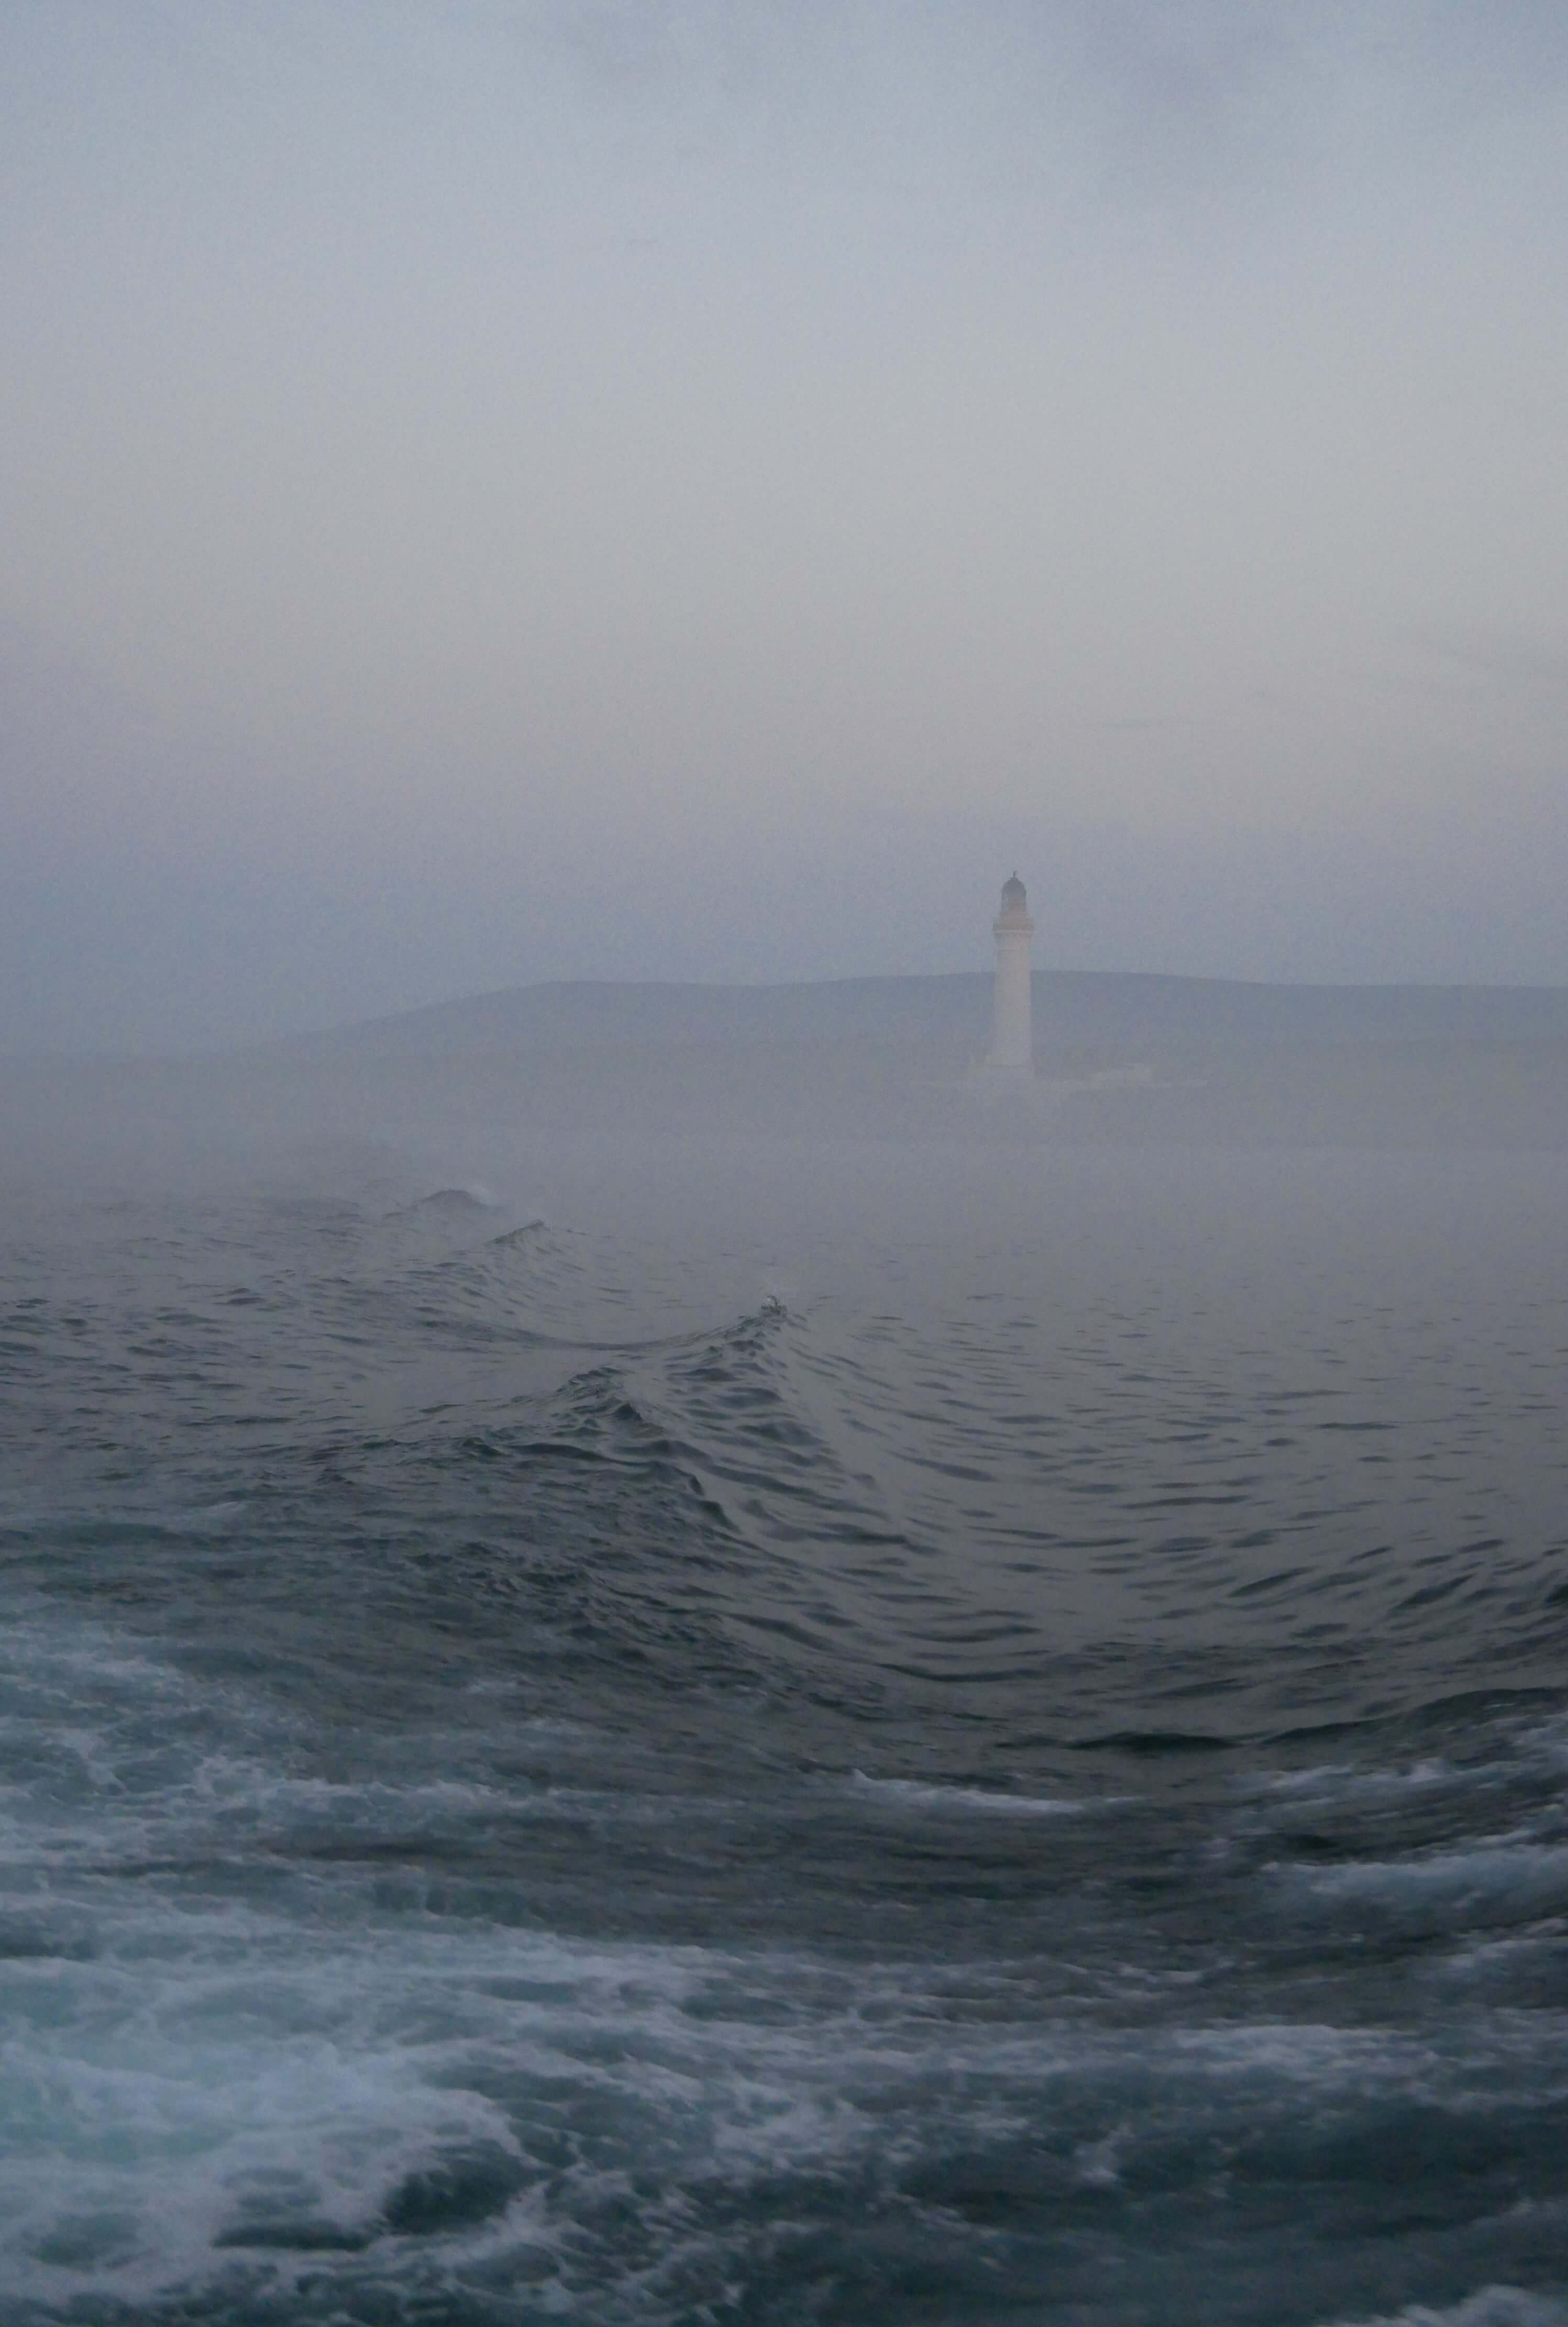 Hoy High lighthouse, island of Graemsay, Orkney Islands, Scotland. Photo credit Rhonda Muir of Orkneyology.com